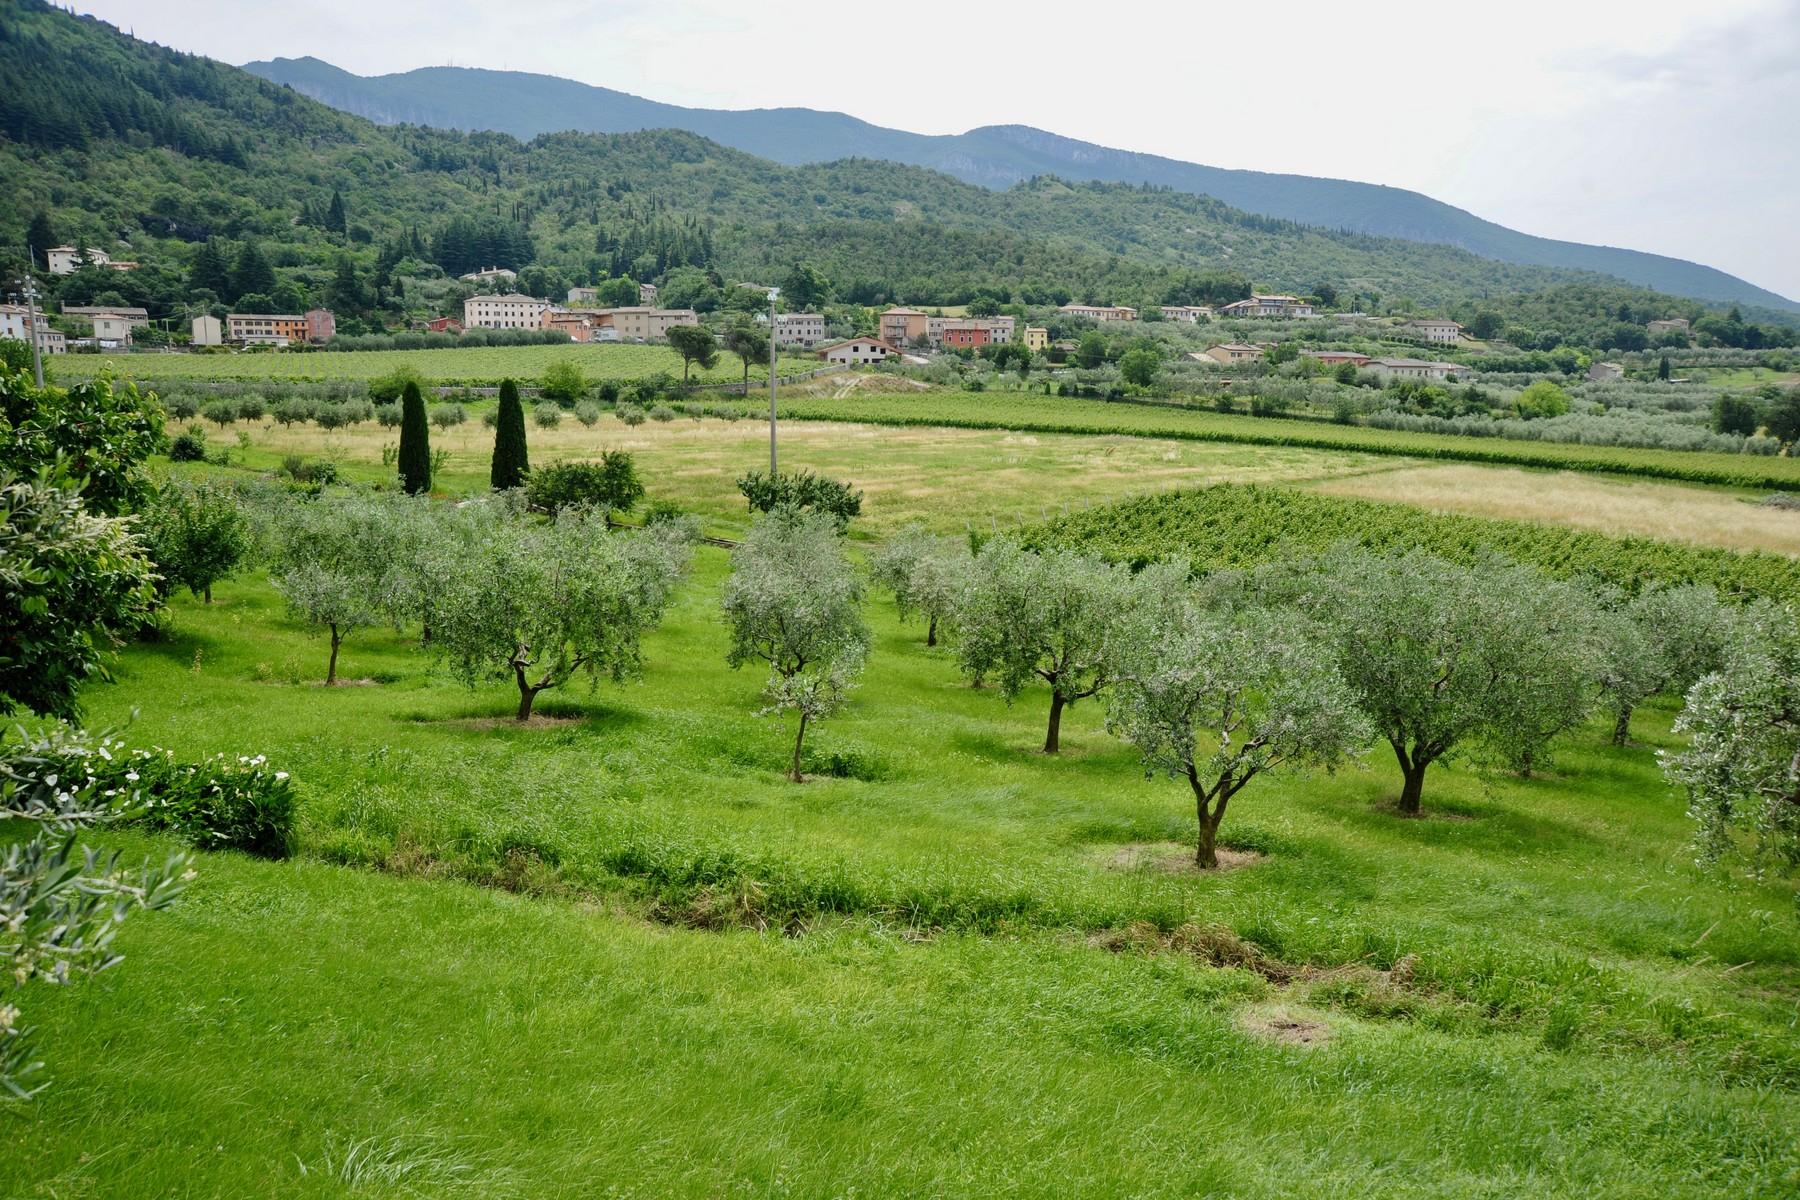 Villa in Vendita a Verona: 5 locali, 450 mq - Foto 15